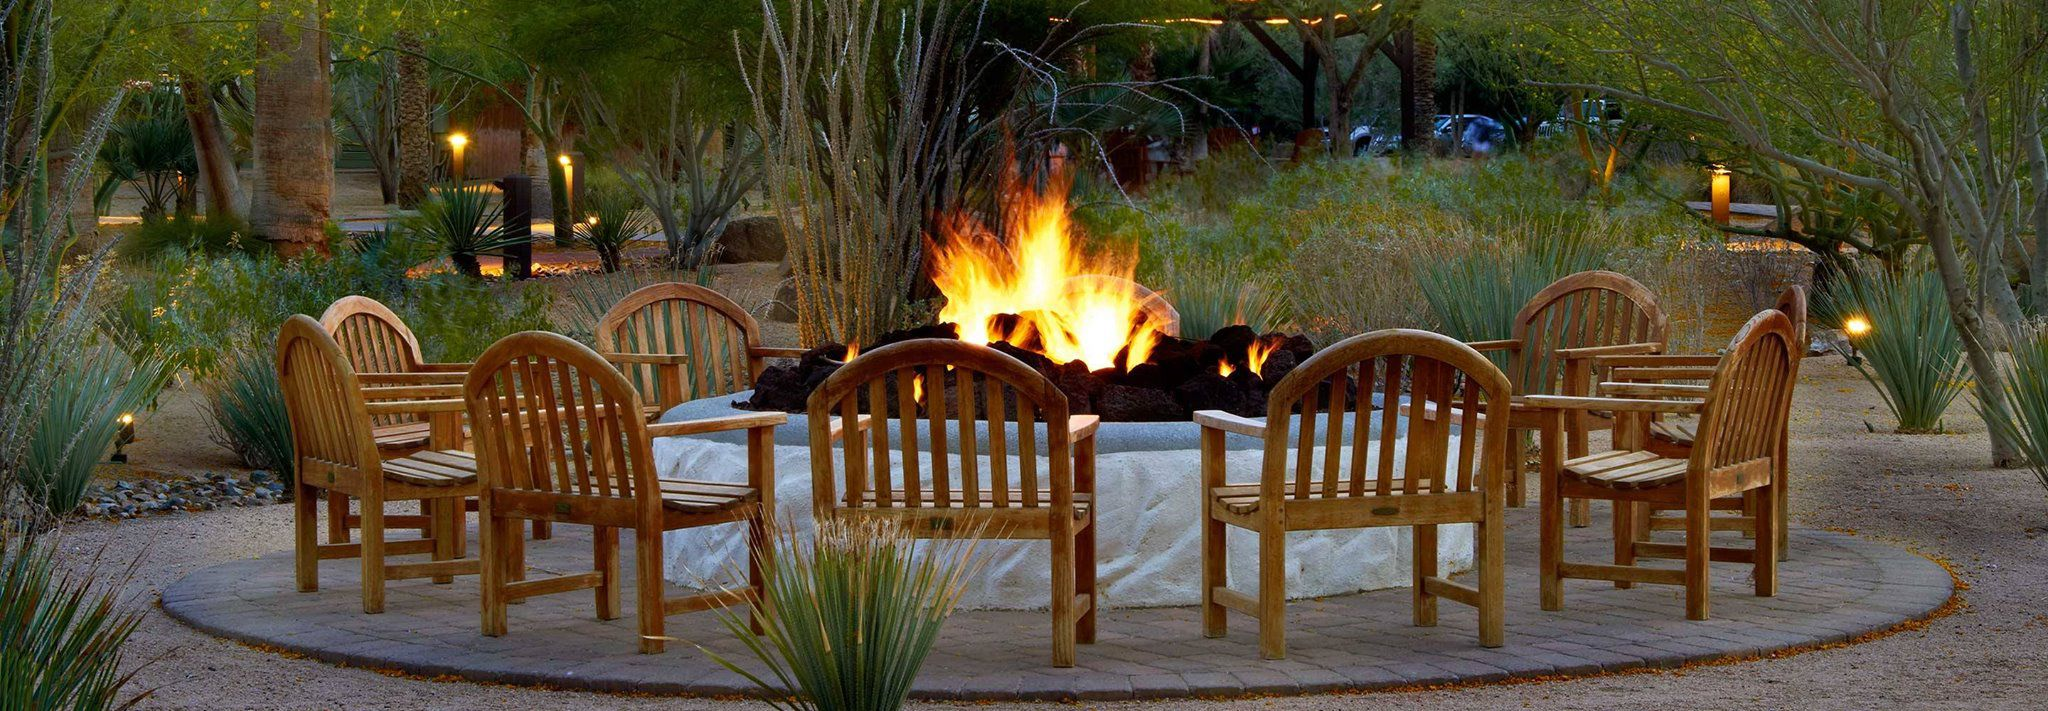 Borrego Springs Ranch Resort And Spa